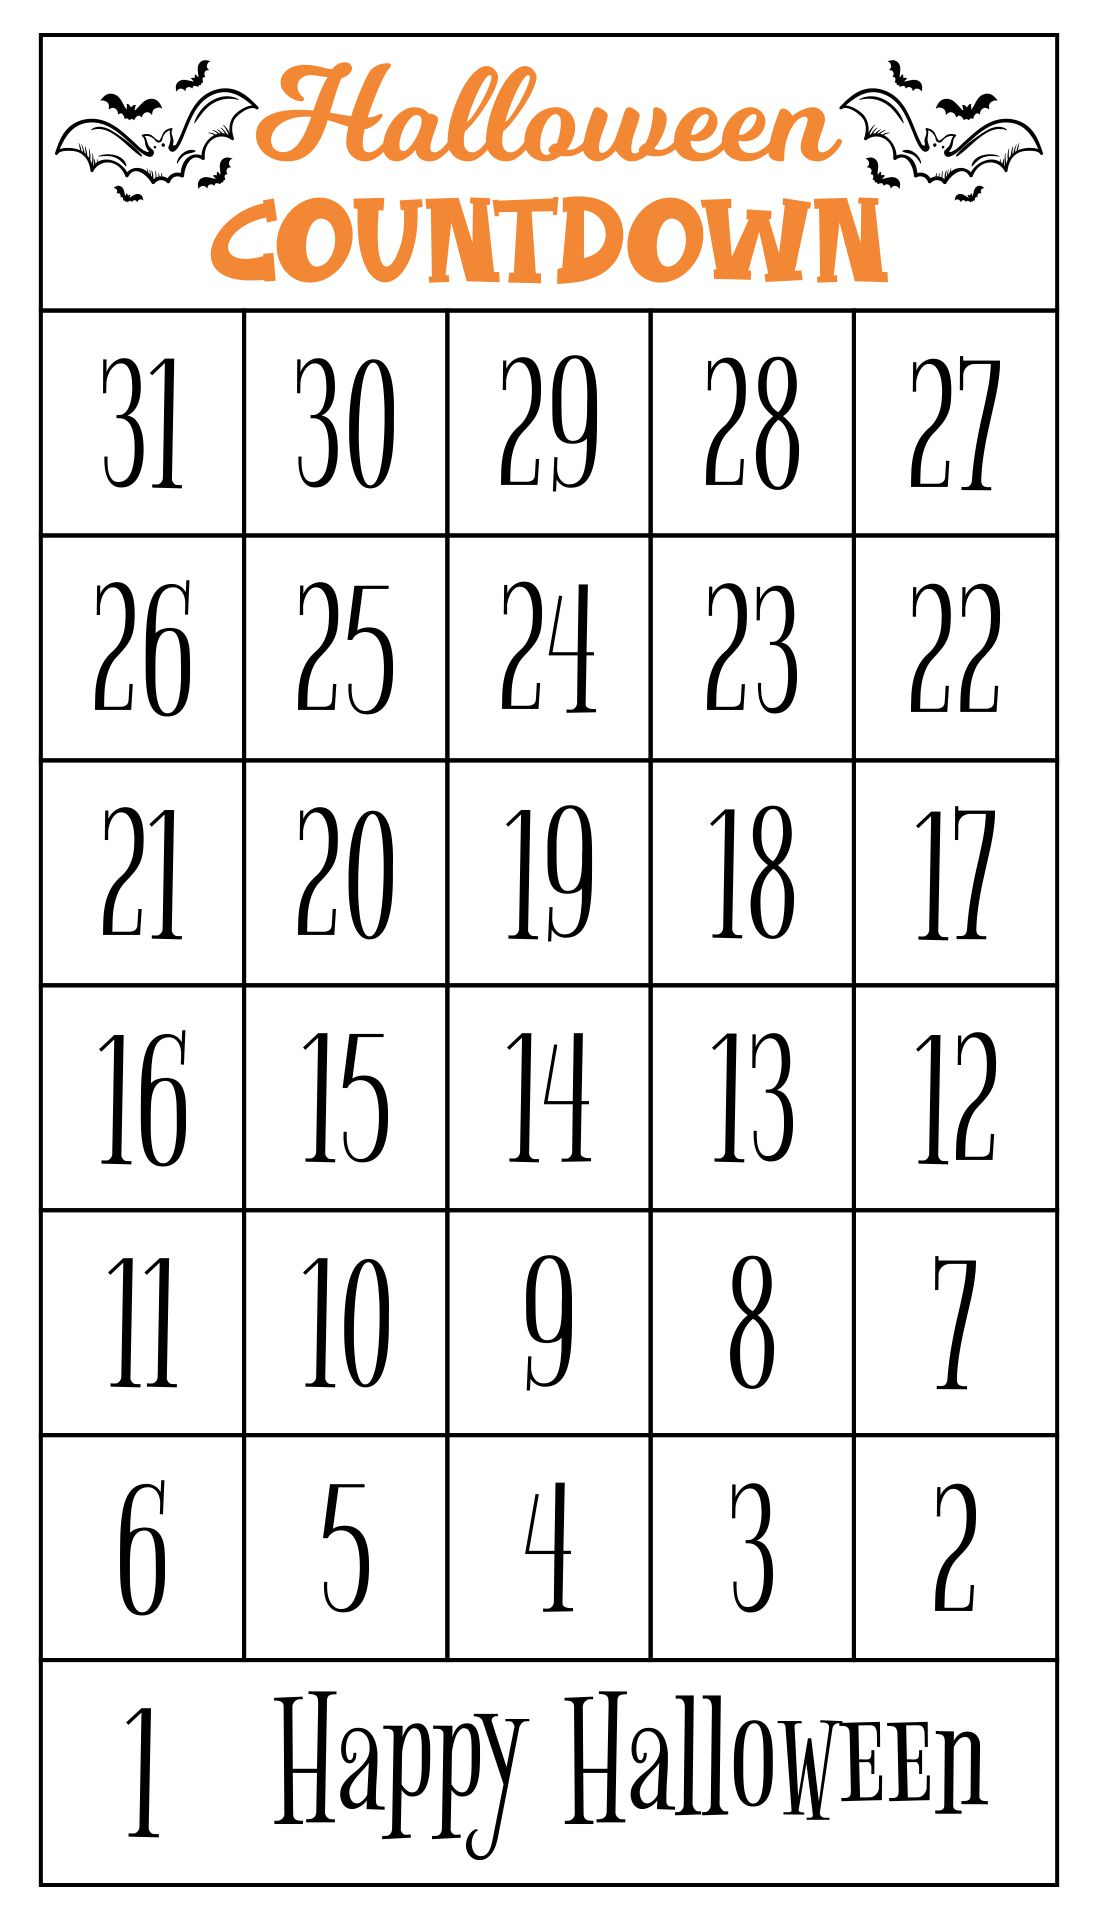 Printable Halloween Countdown Calendar